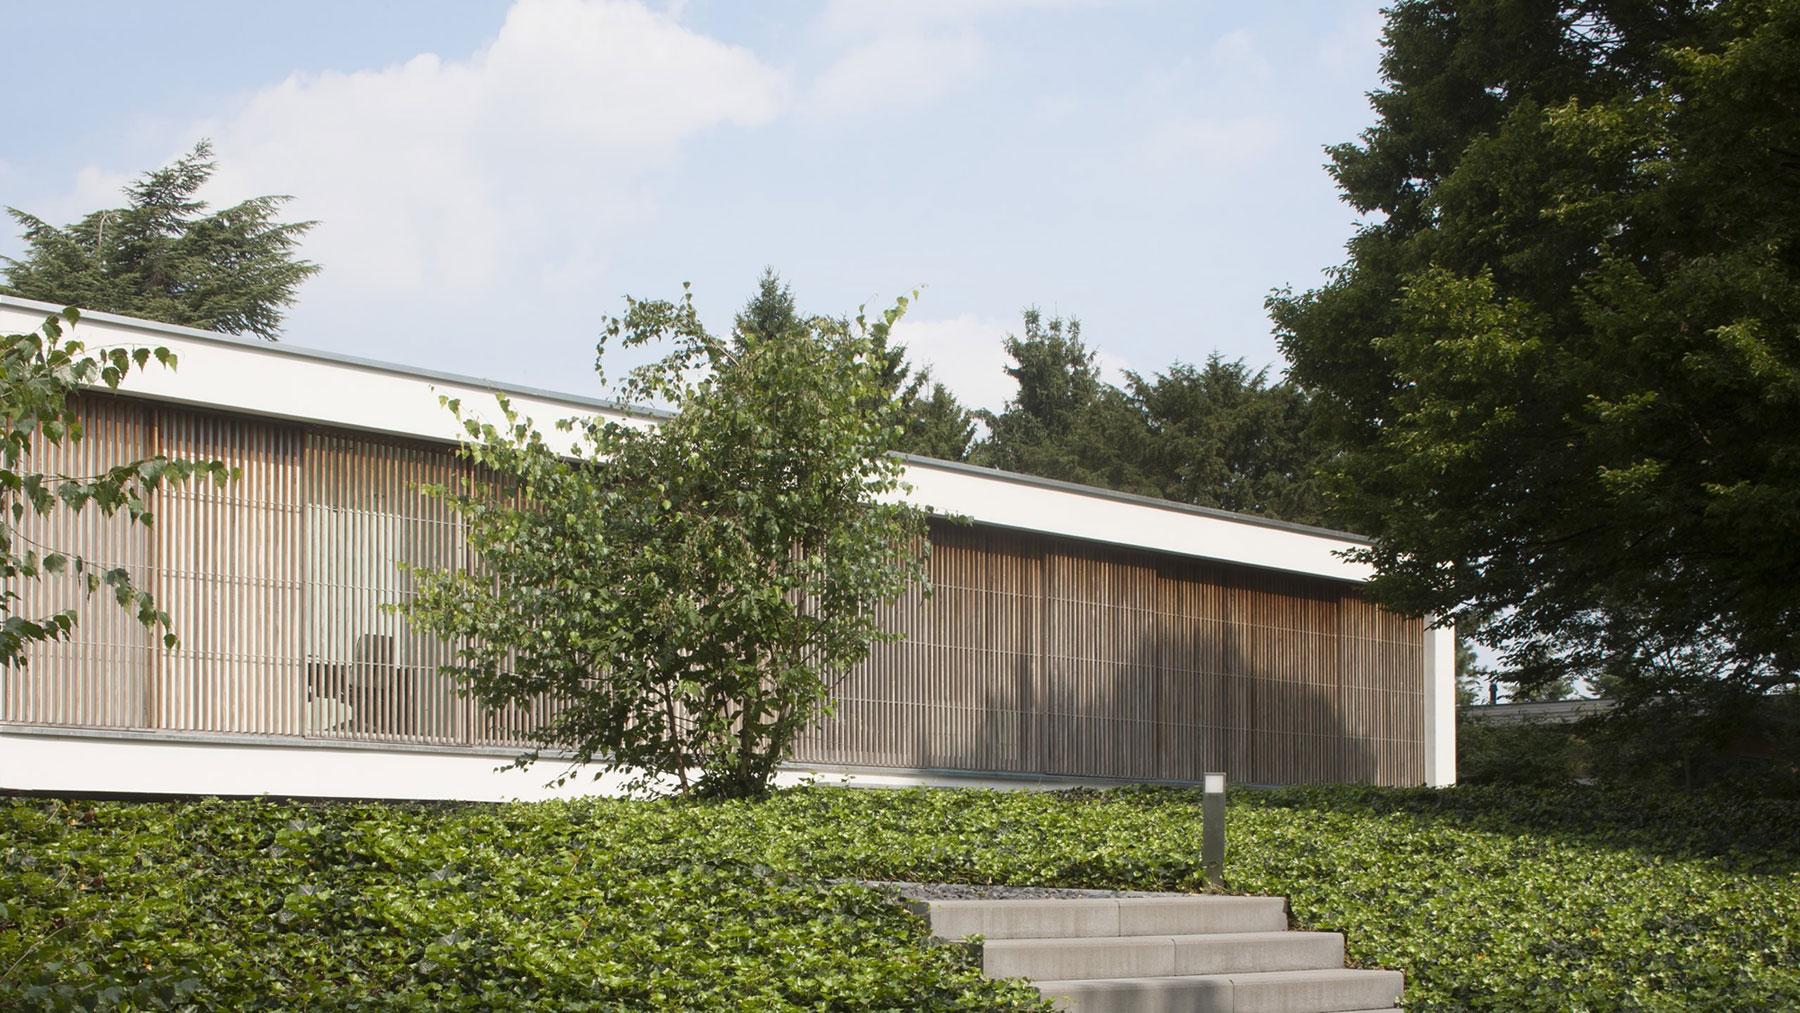 Boxed Villa Spee Haelen with Panoramic Windows by Lab32 architecten-08